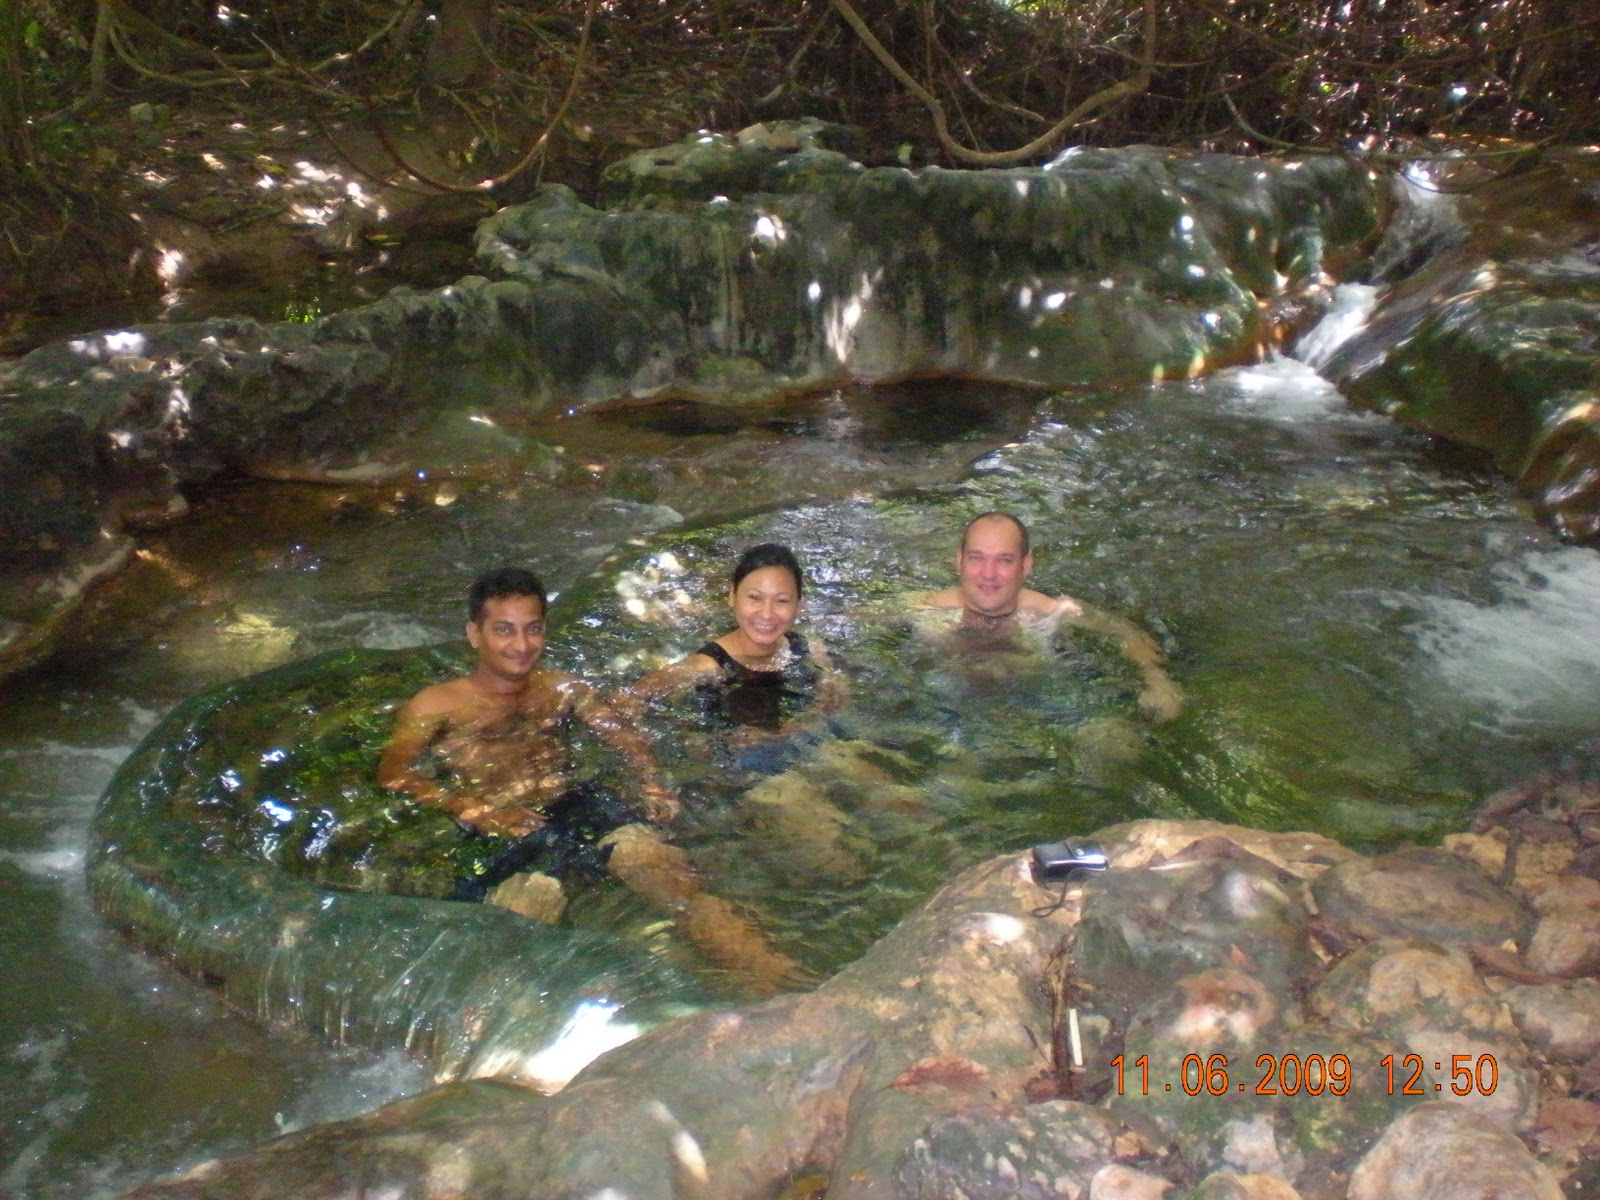 Cybercaptain: Hot springs and Sa Morakot pools